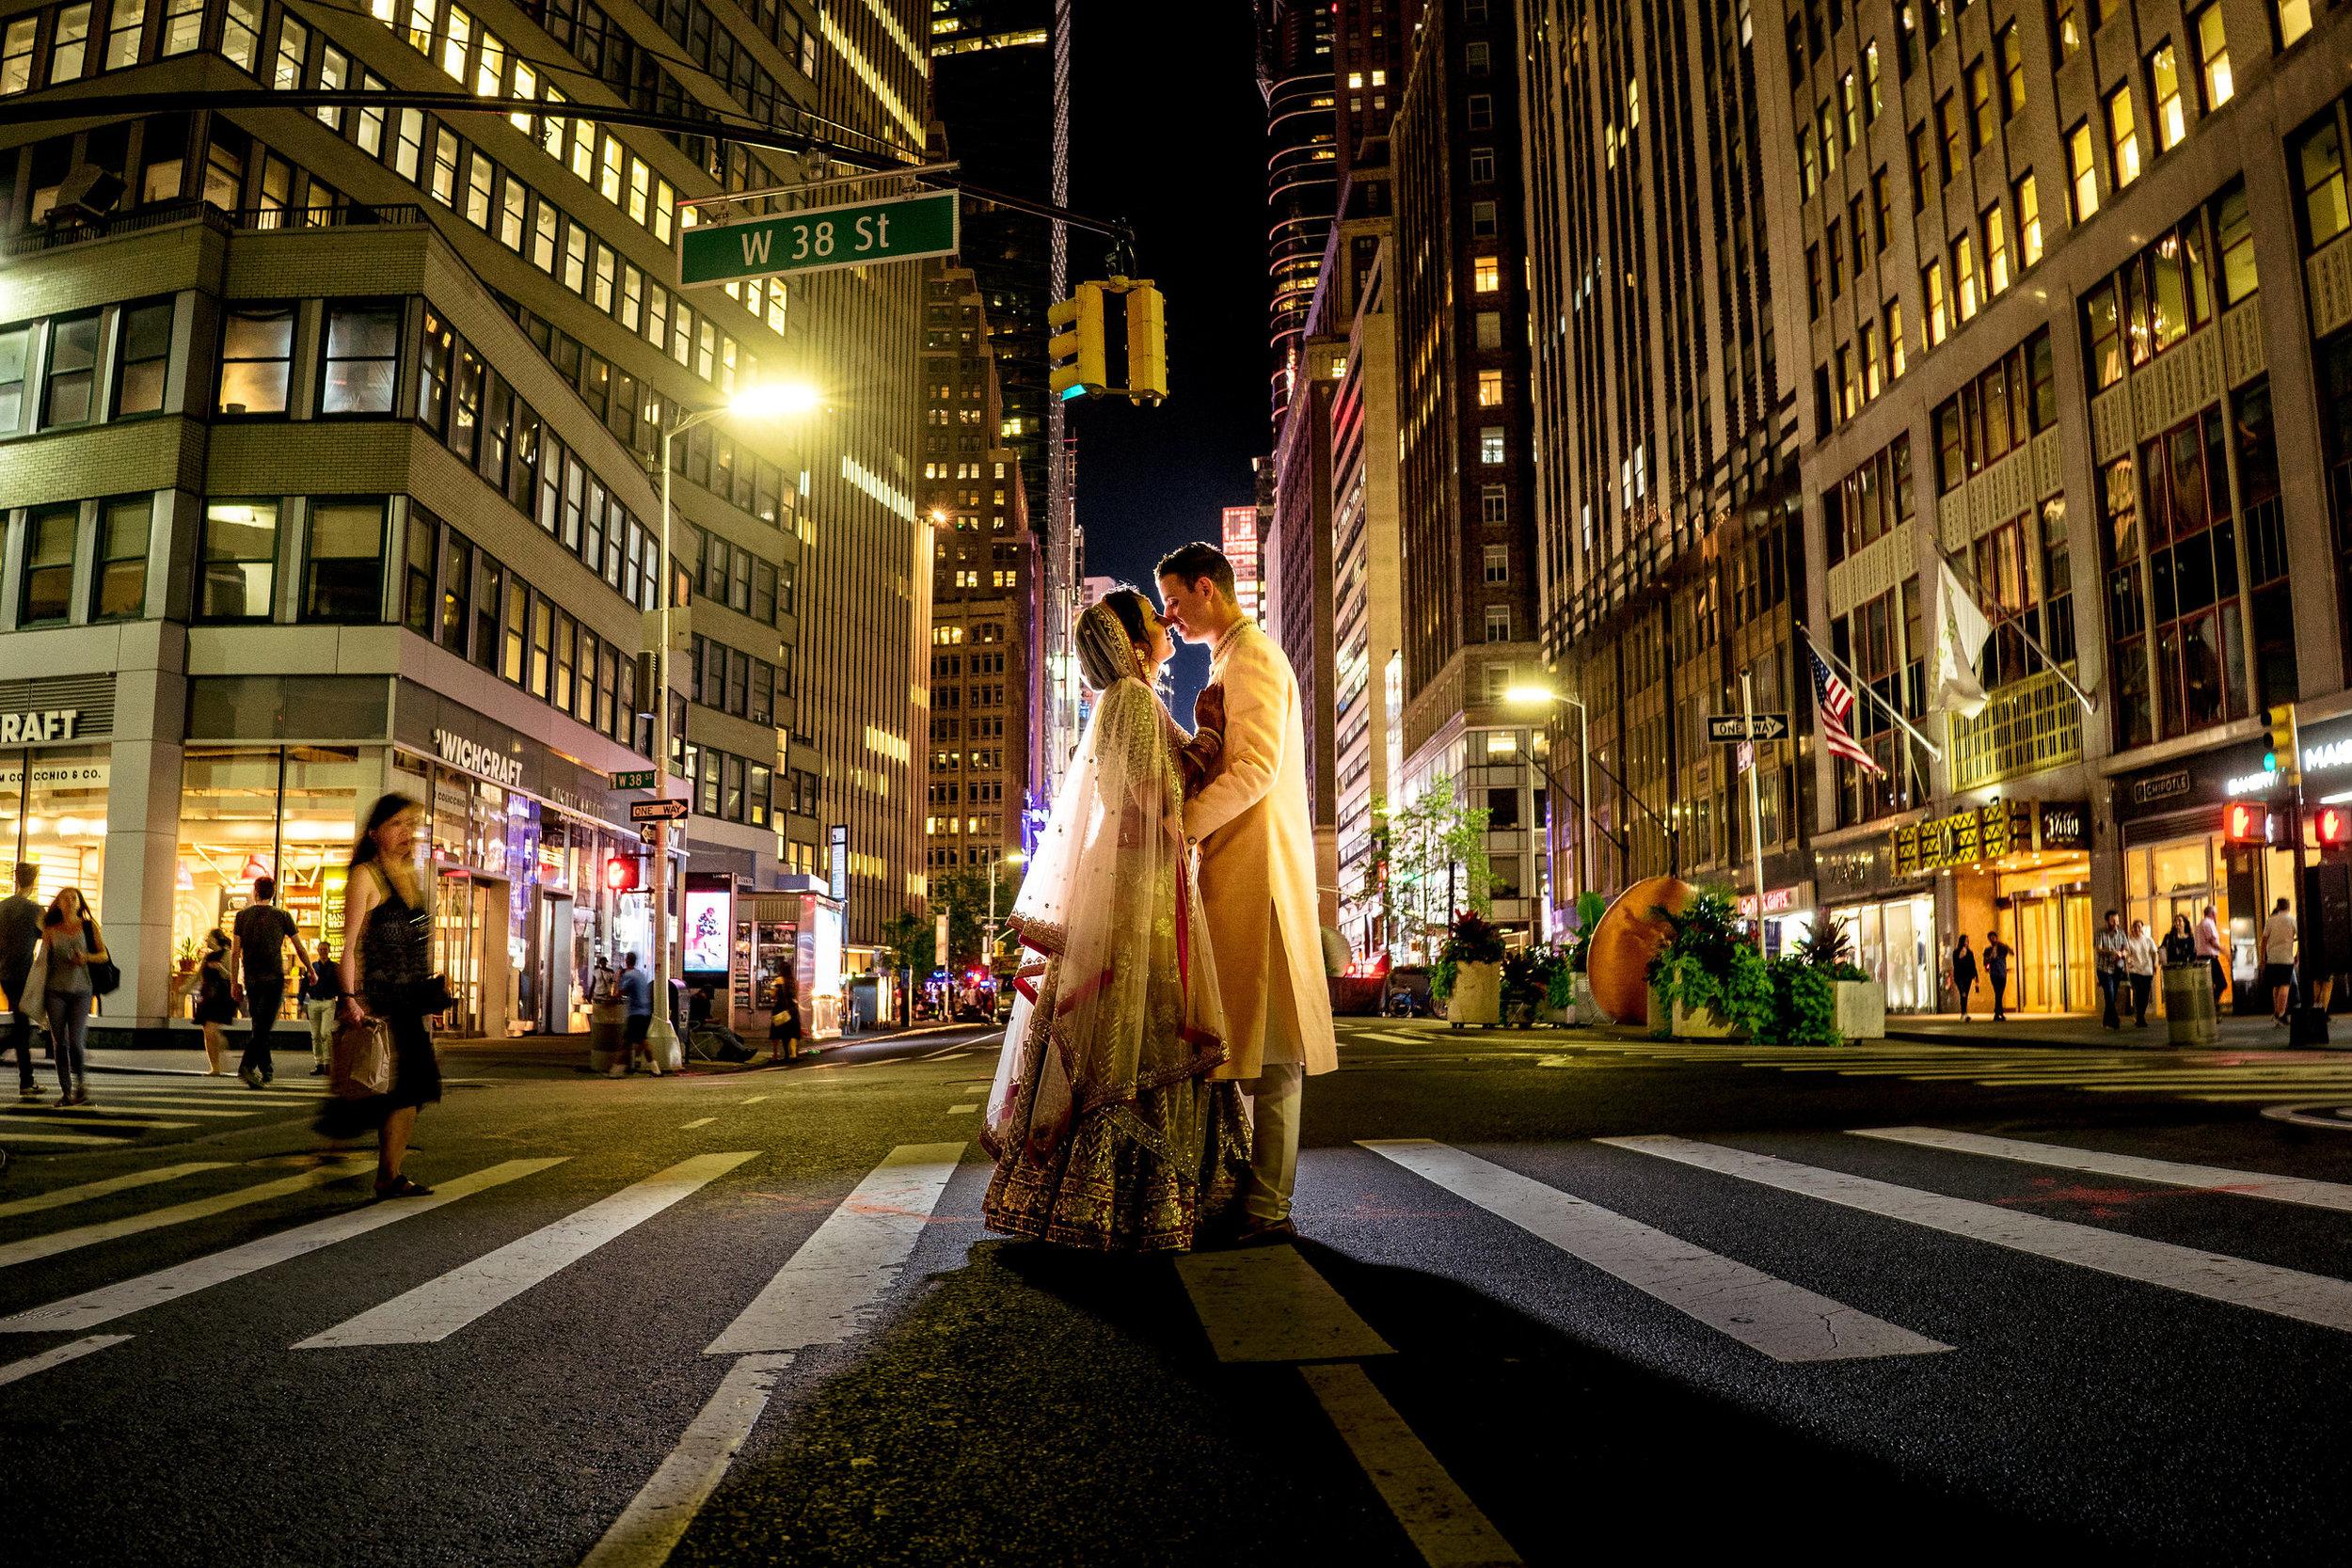 INDIAN WEDDING BRIDE AND GROOM STREET SHOT.JPG